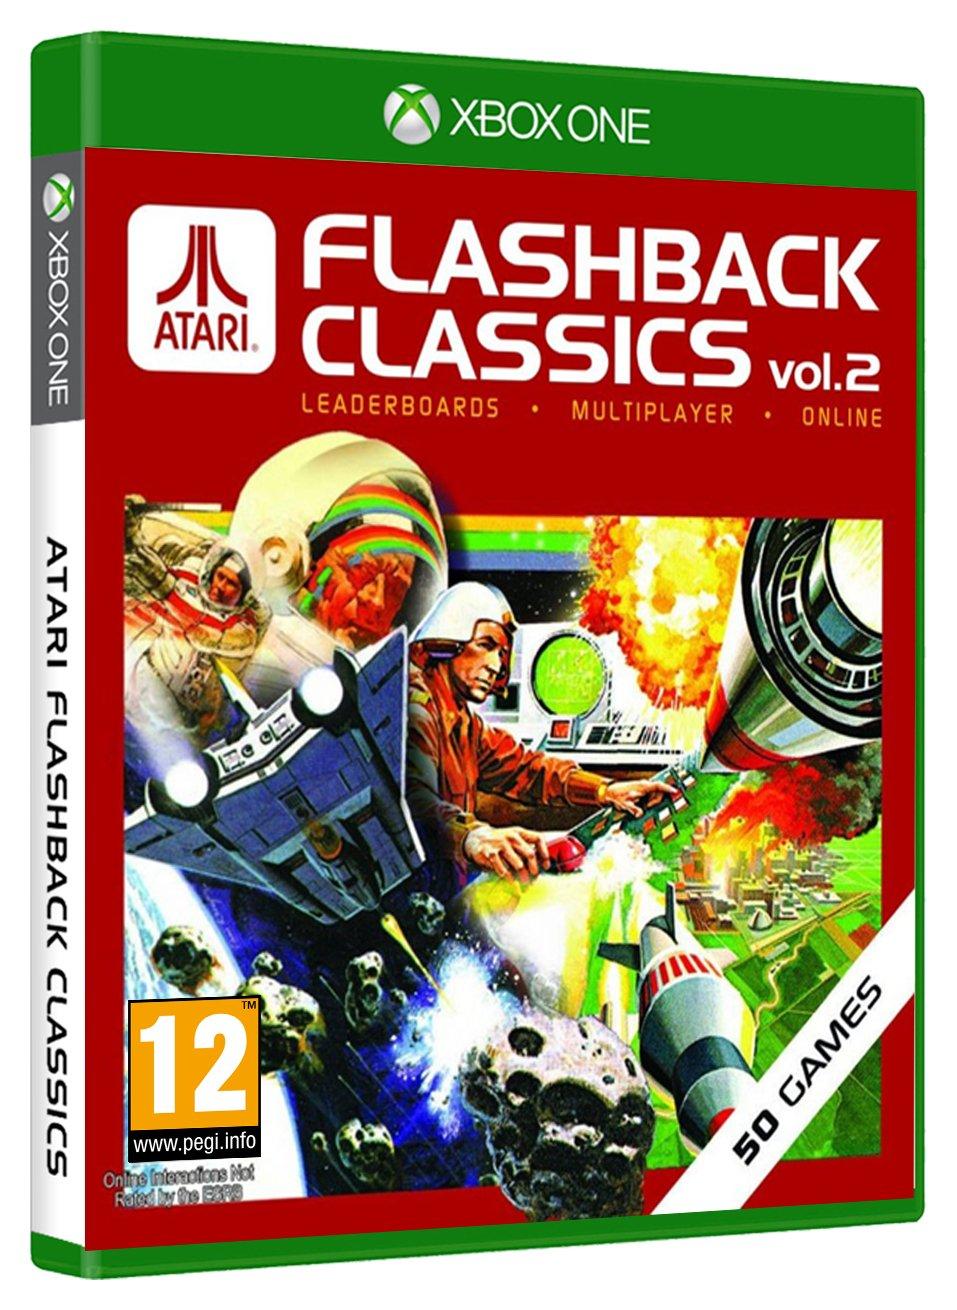 Image of Atari Flashback Classics Volume 2 Xbox One Game